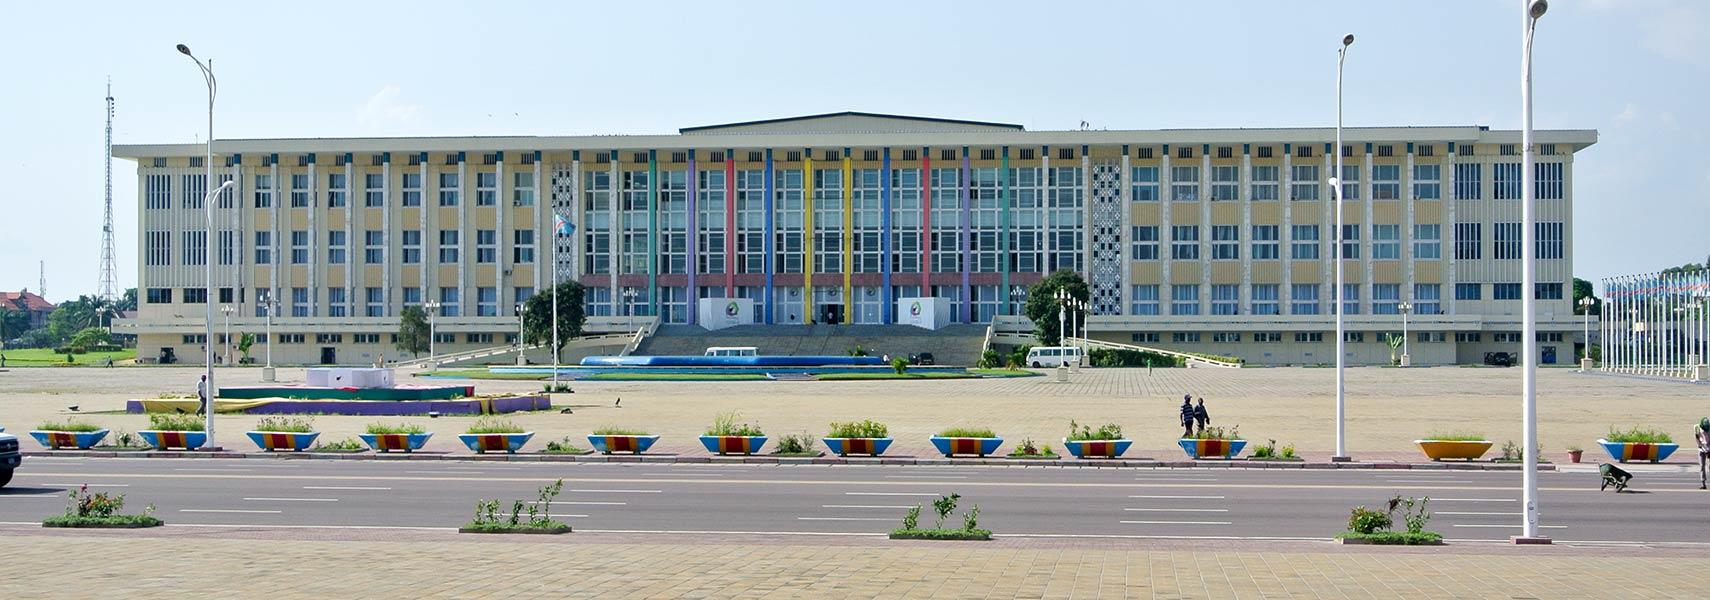 Google Map of Kinshasa, Democratic Republic of the Congo   Nations